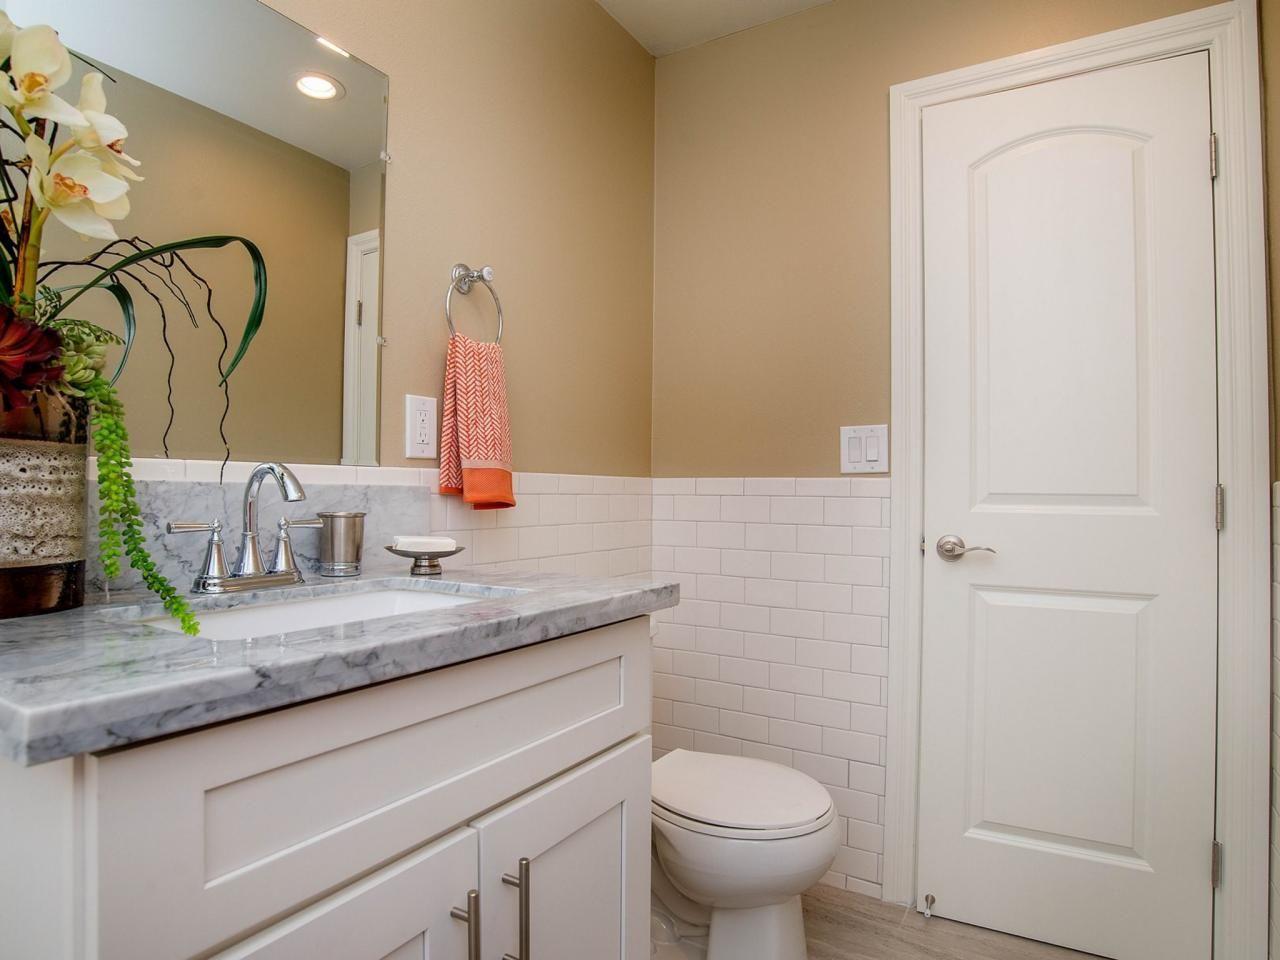 Flip Flop Bathroom Decor 17 Best Ideas About Flip Flop Hgtv On Pinterest Flip Flop